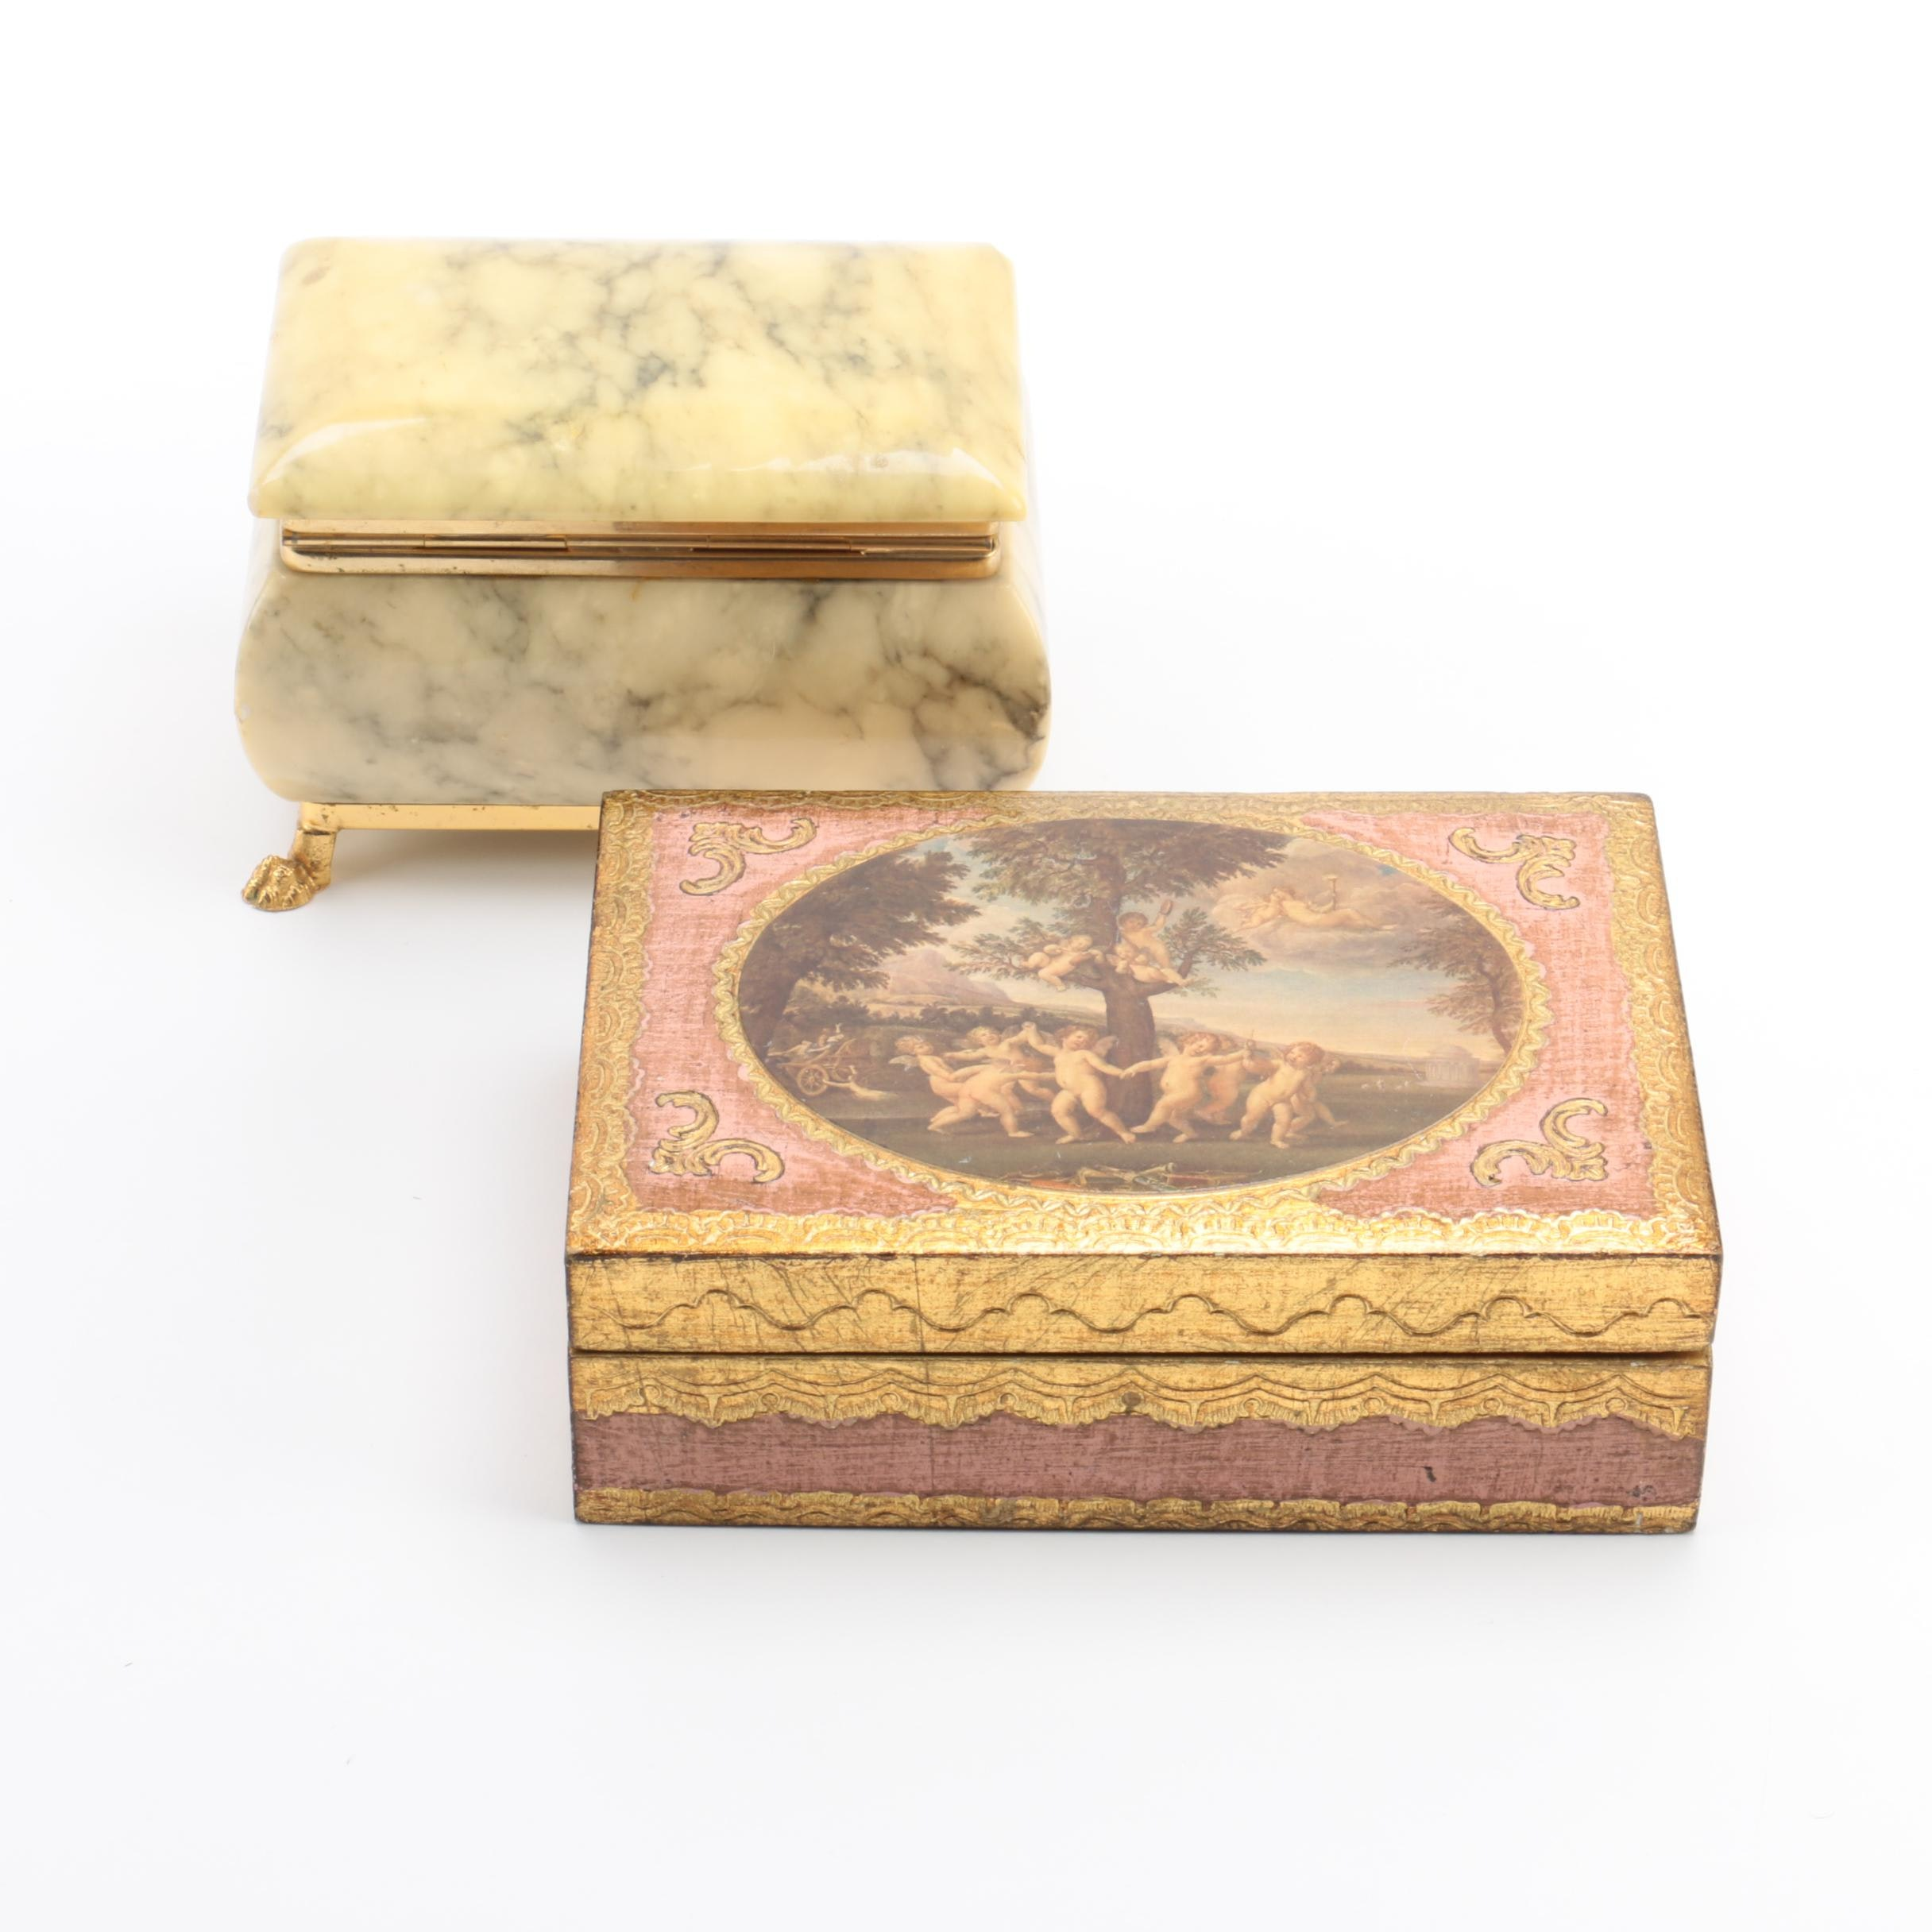 Alabaster and Wood Trinket Boxes